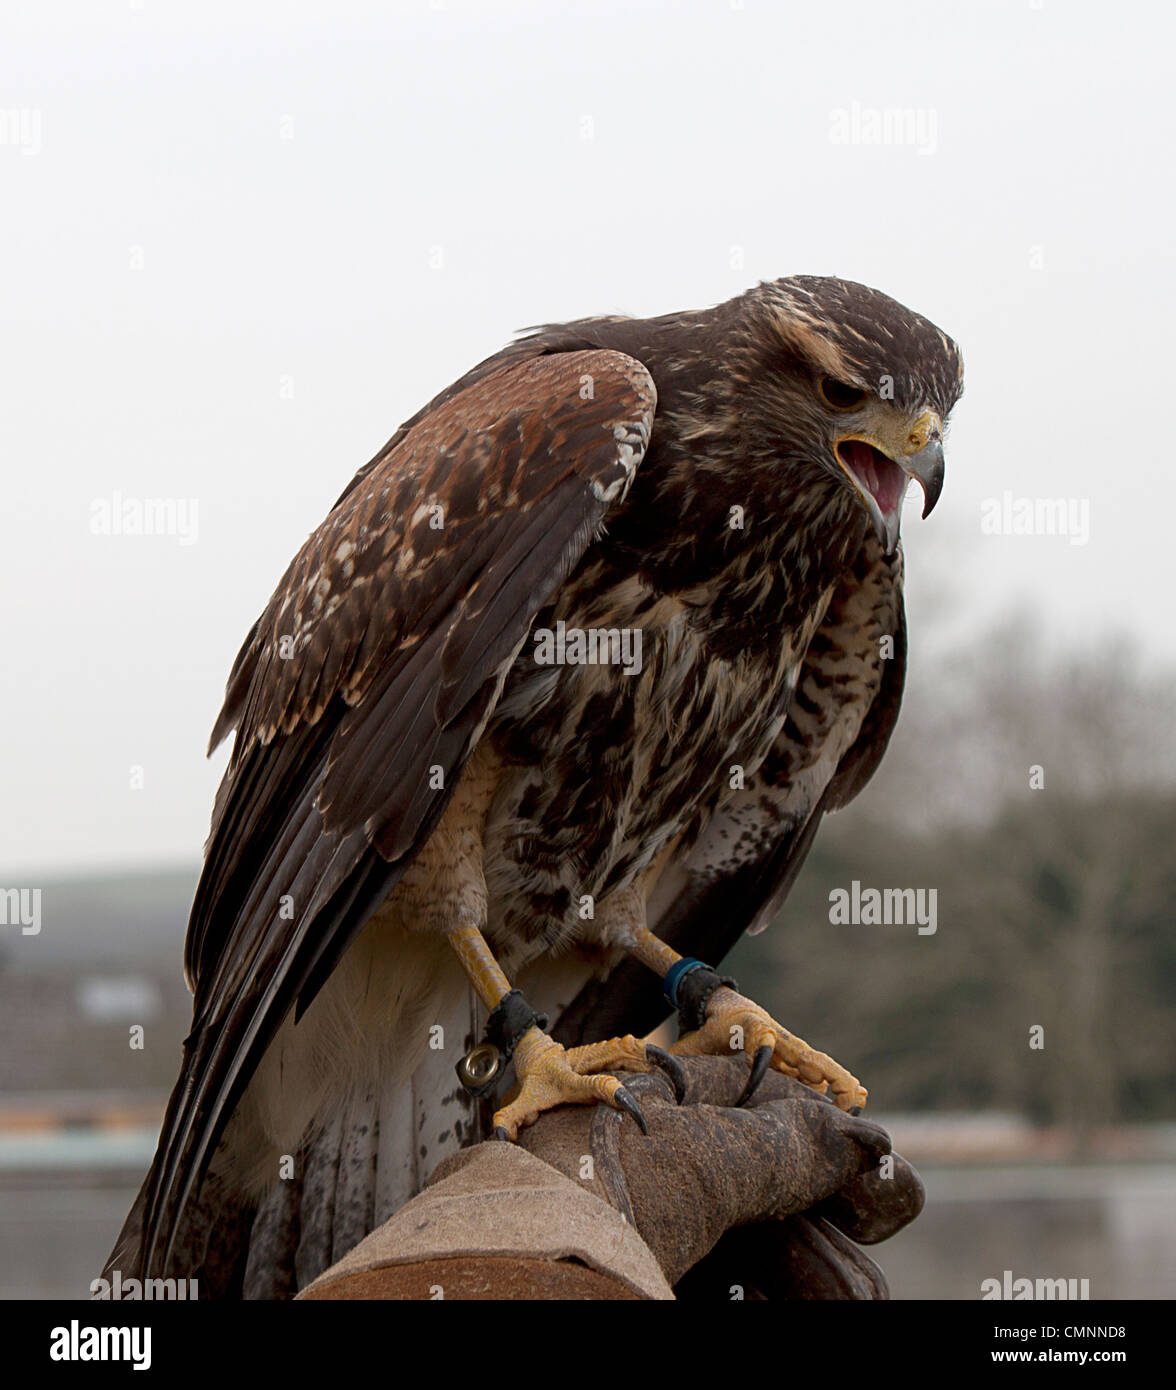 Harris Hawk, Parabuteo unicinctus, Accipitridae. Captive Bird. Falconry - Stock Image